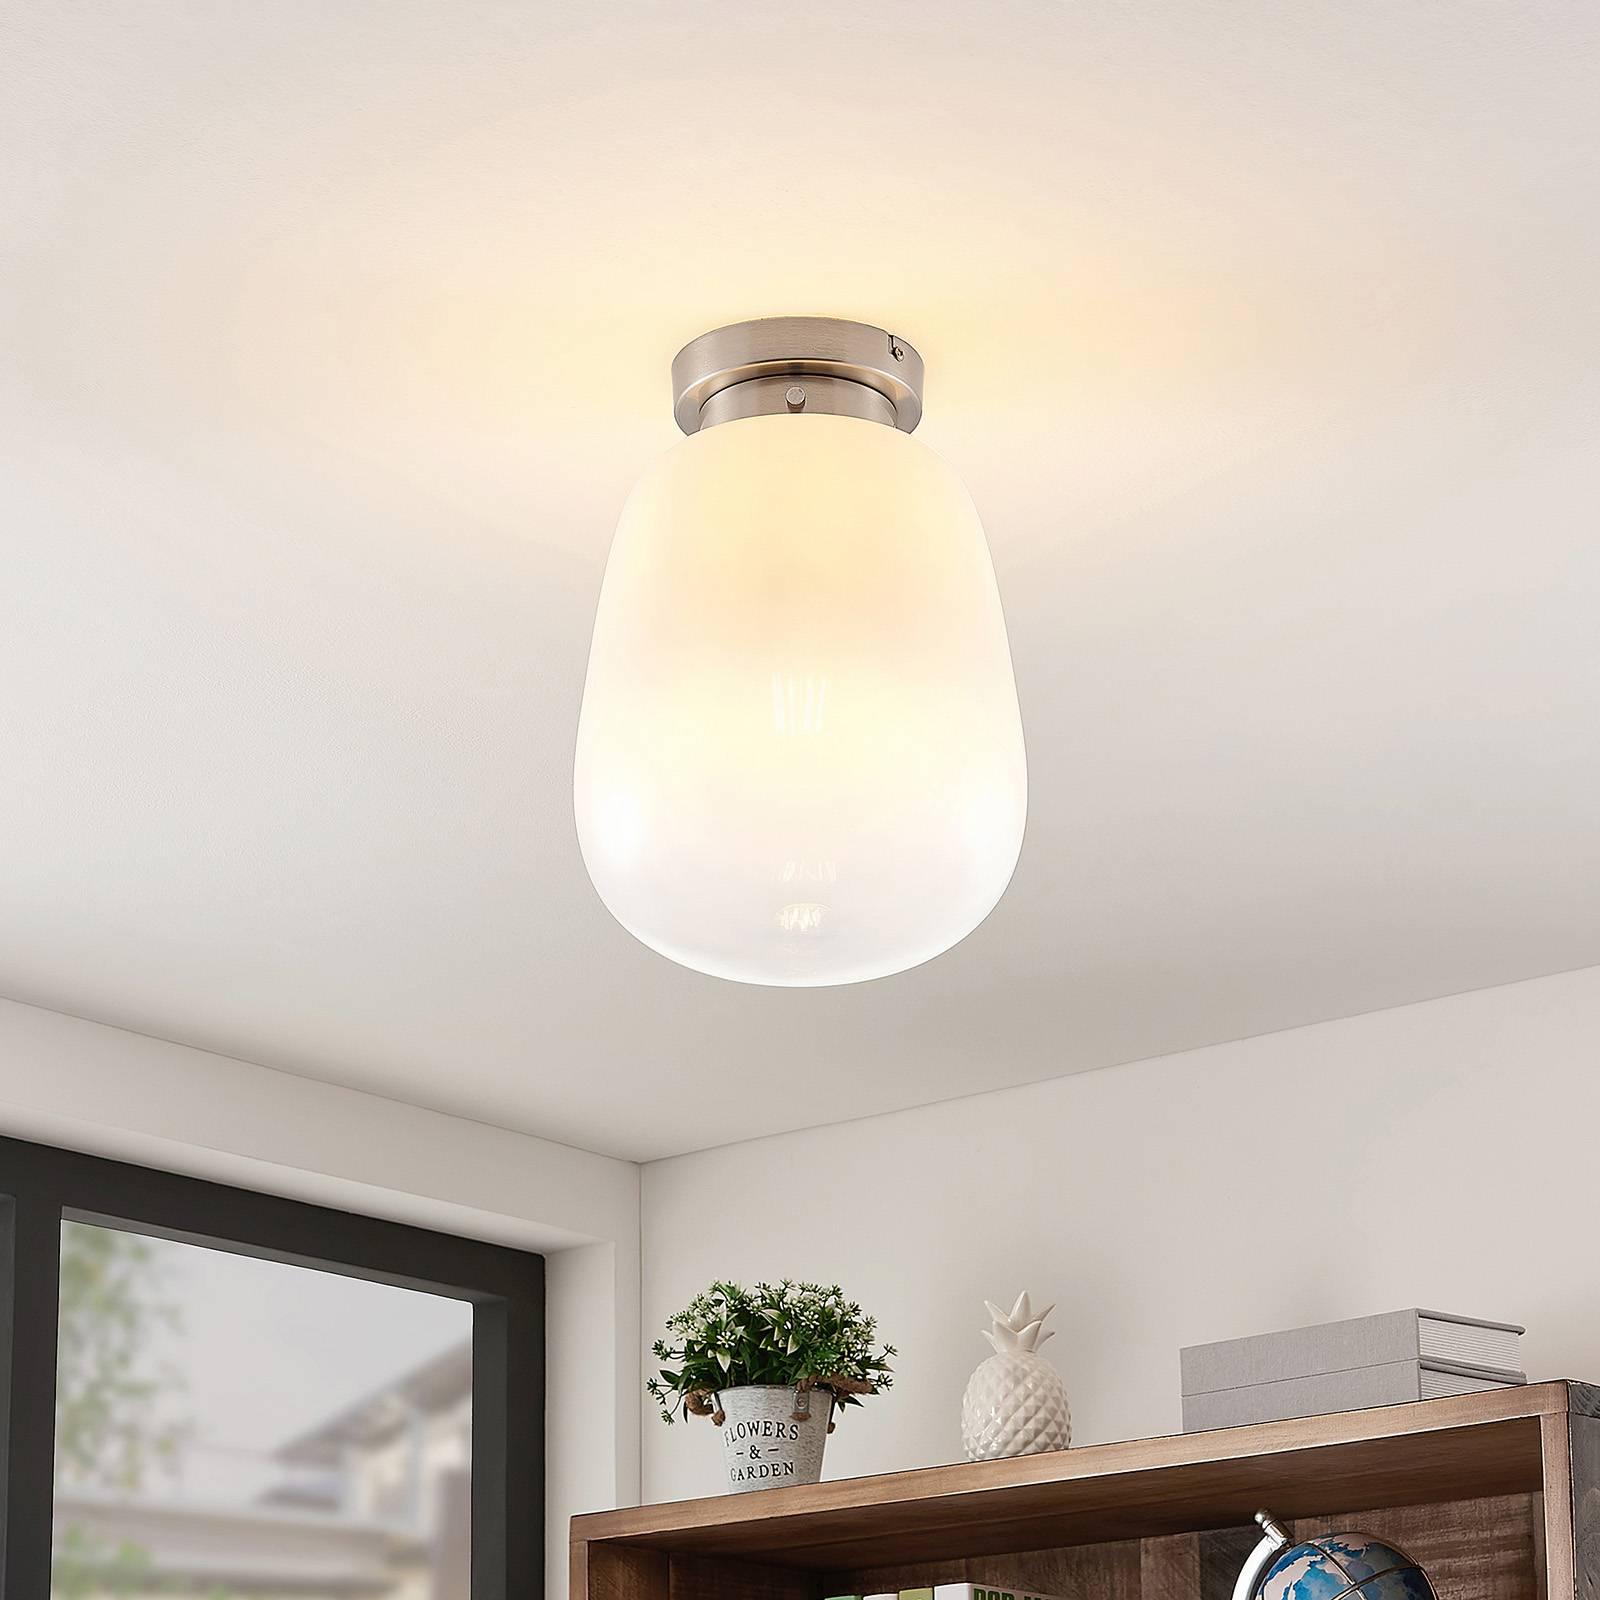 Lucande Tessi szklana lampa sufitowa